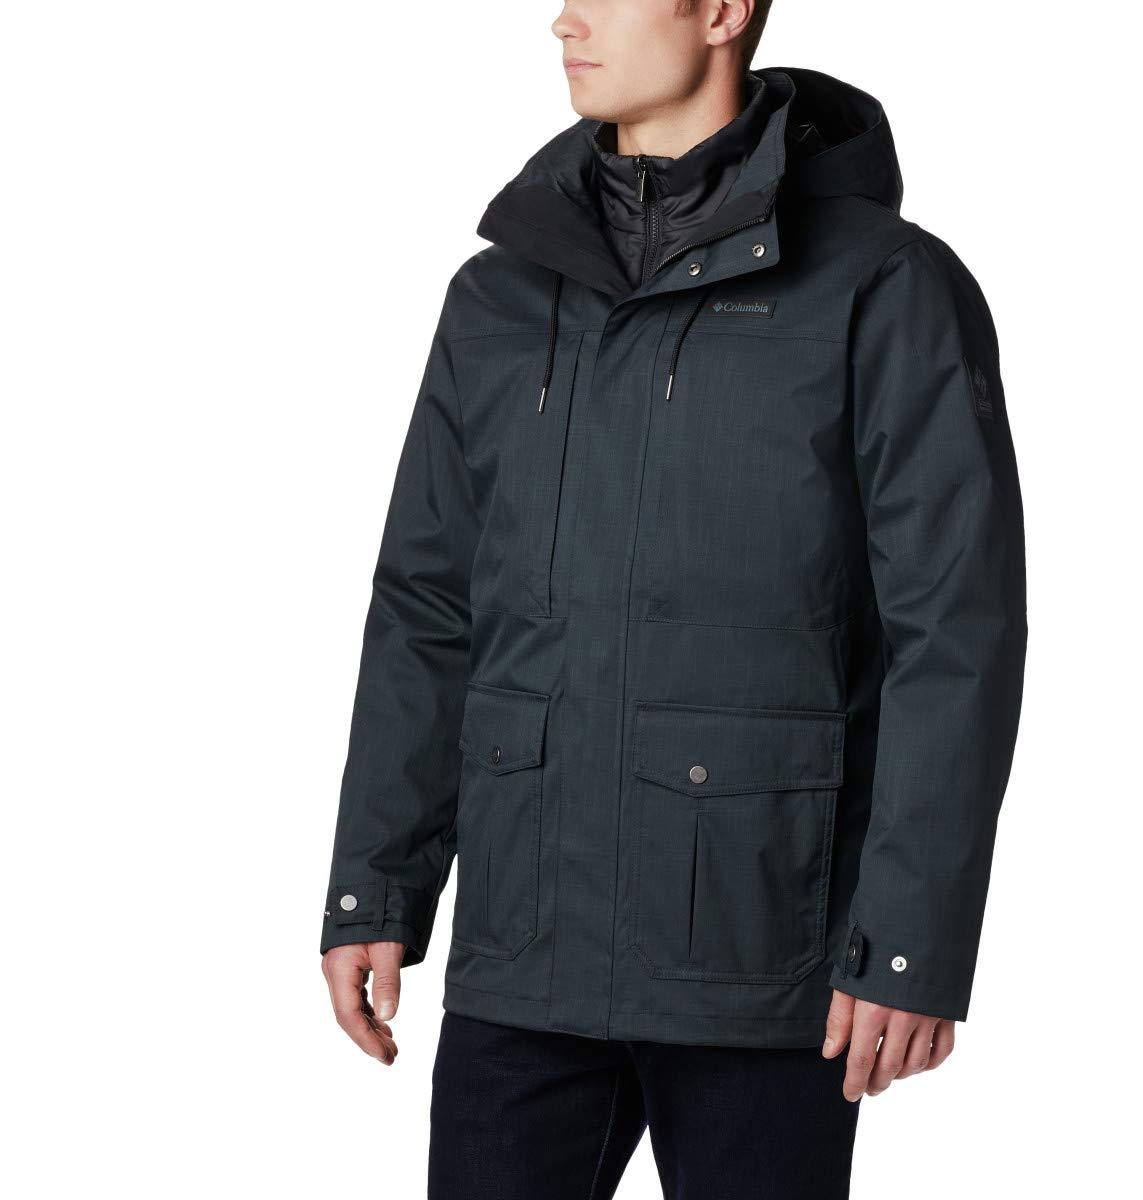 Rab Microlight Alpine Jacket Daunenjacke günstig bei